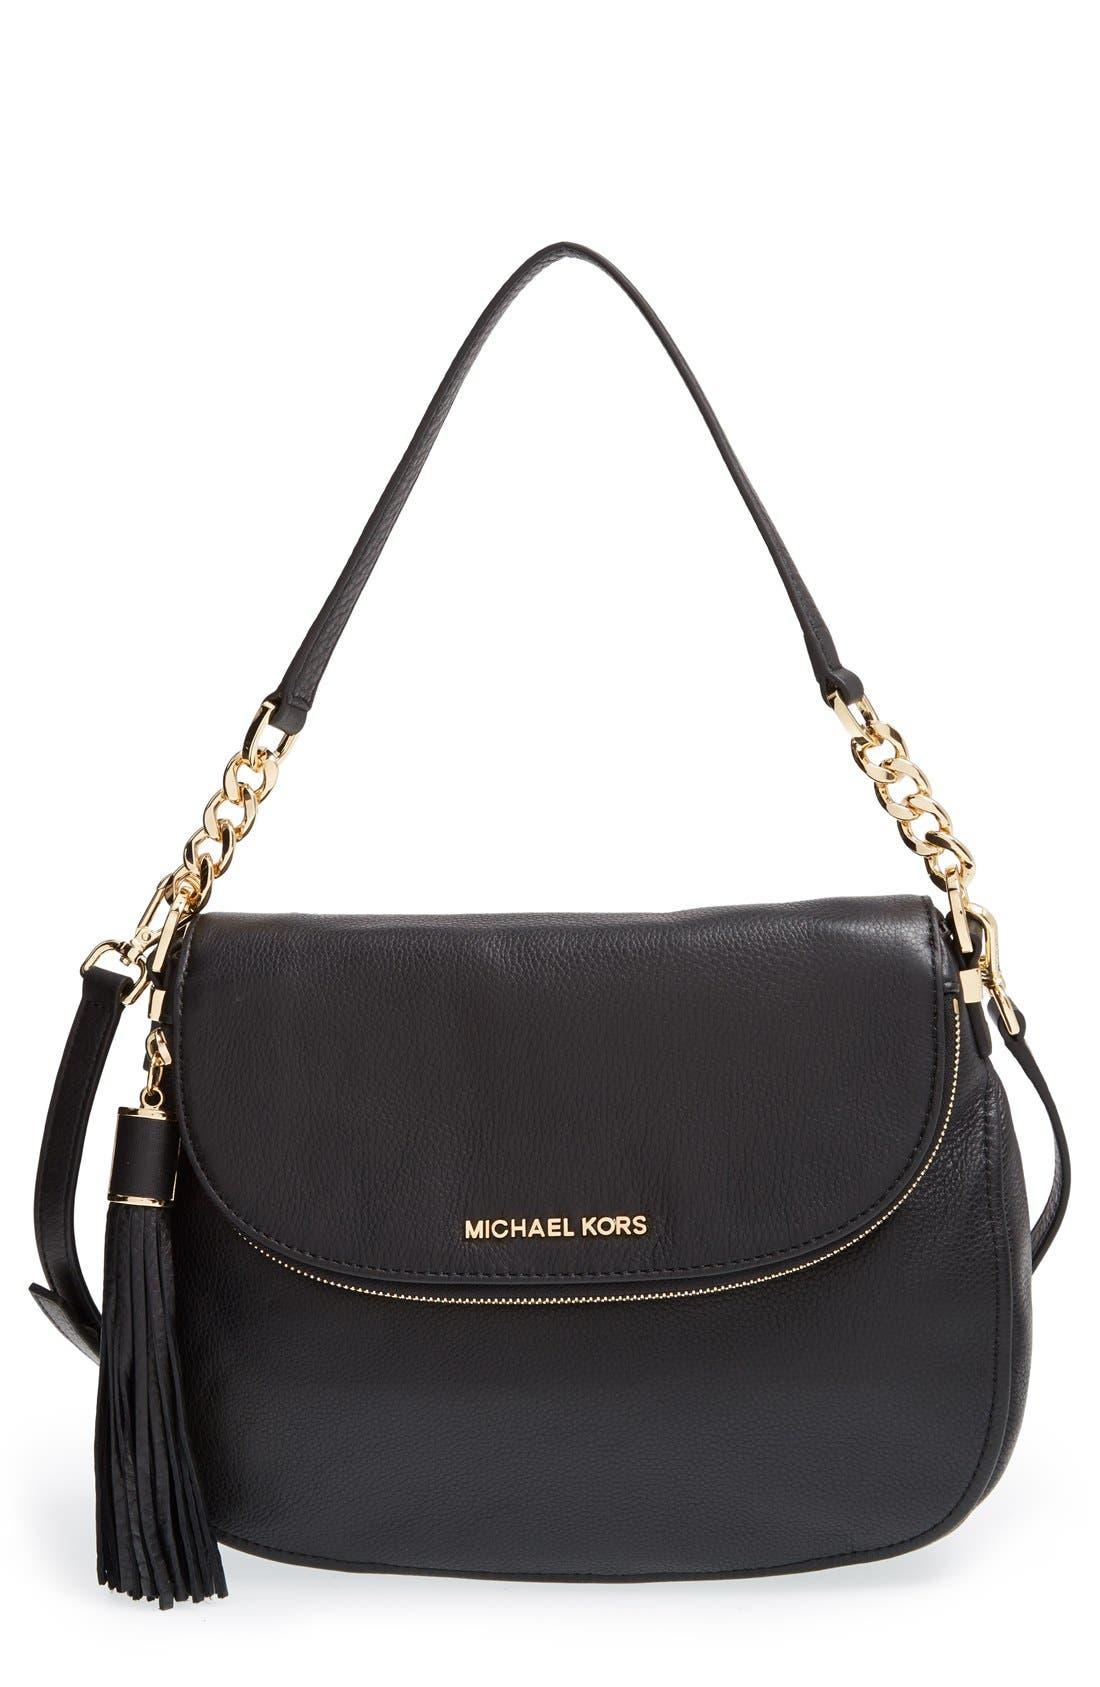 'Bedford Tassel - Medium' Convertible Leather Shoulder Bag,                             Main thumbnail 1, color,                             005